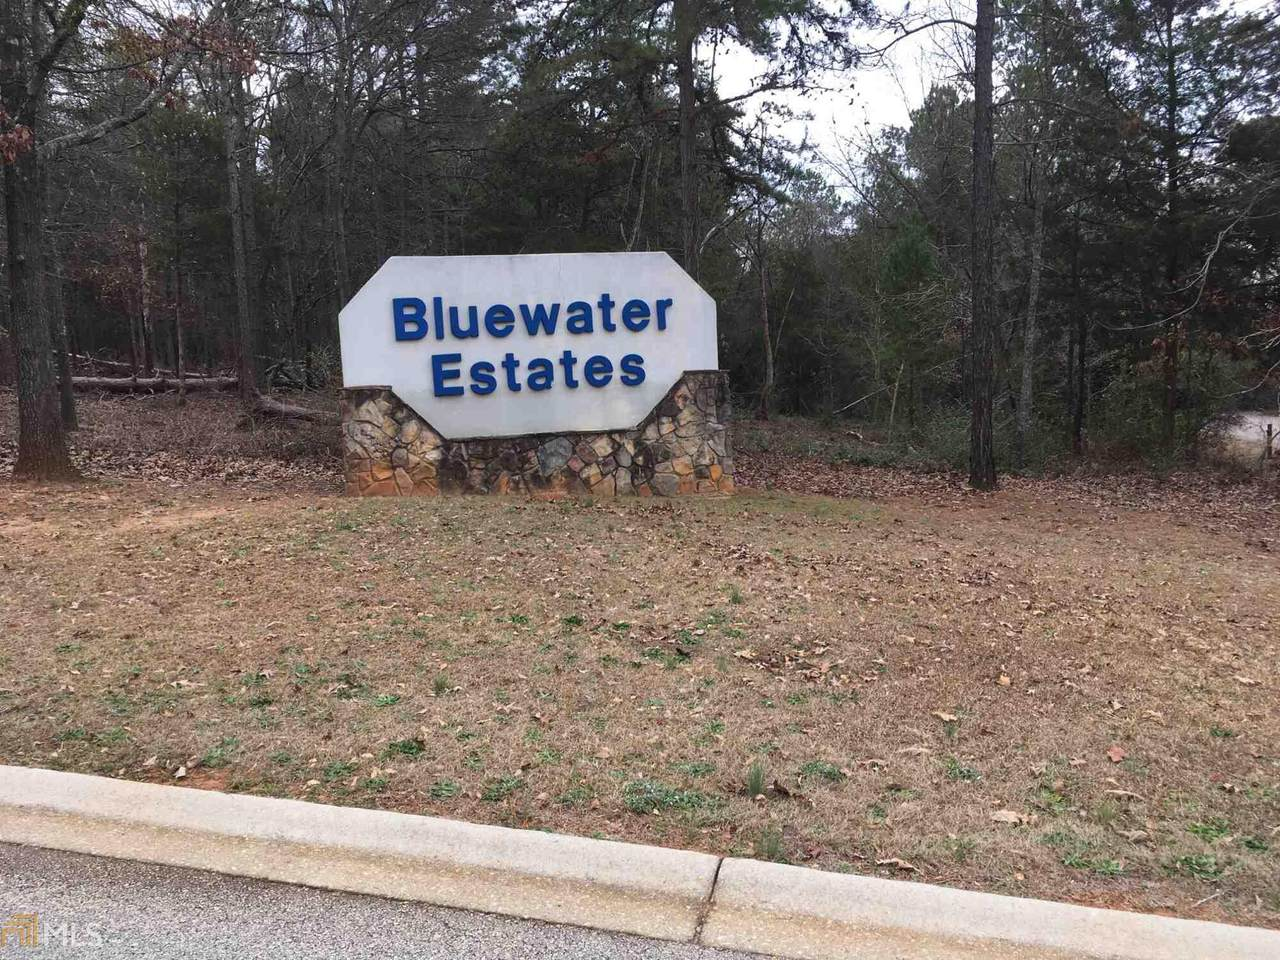 0 Bluewater Estates - Photo 1